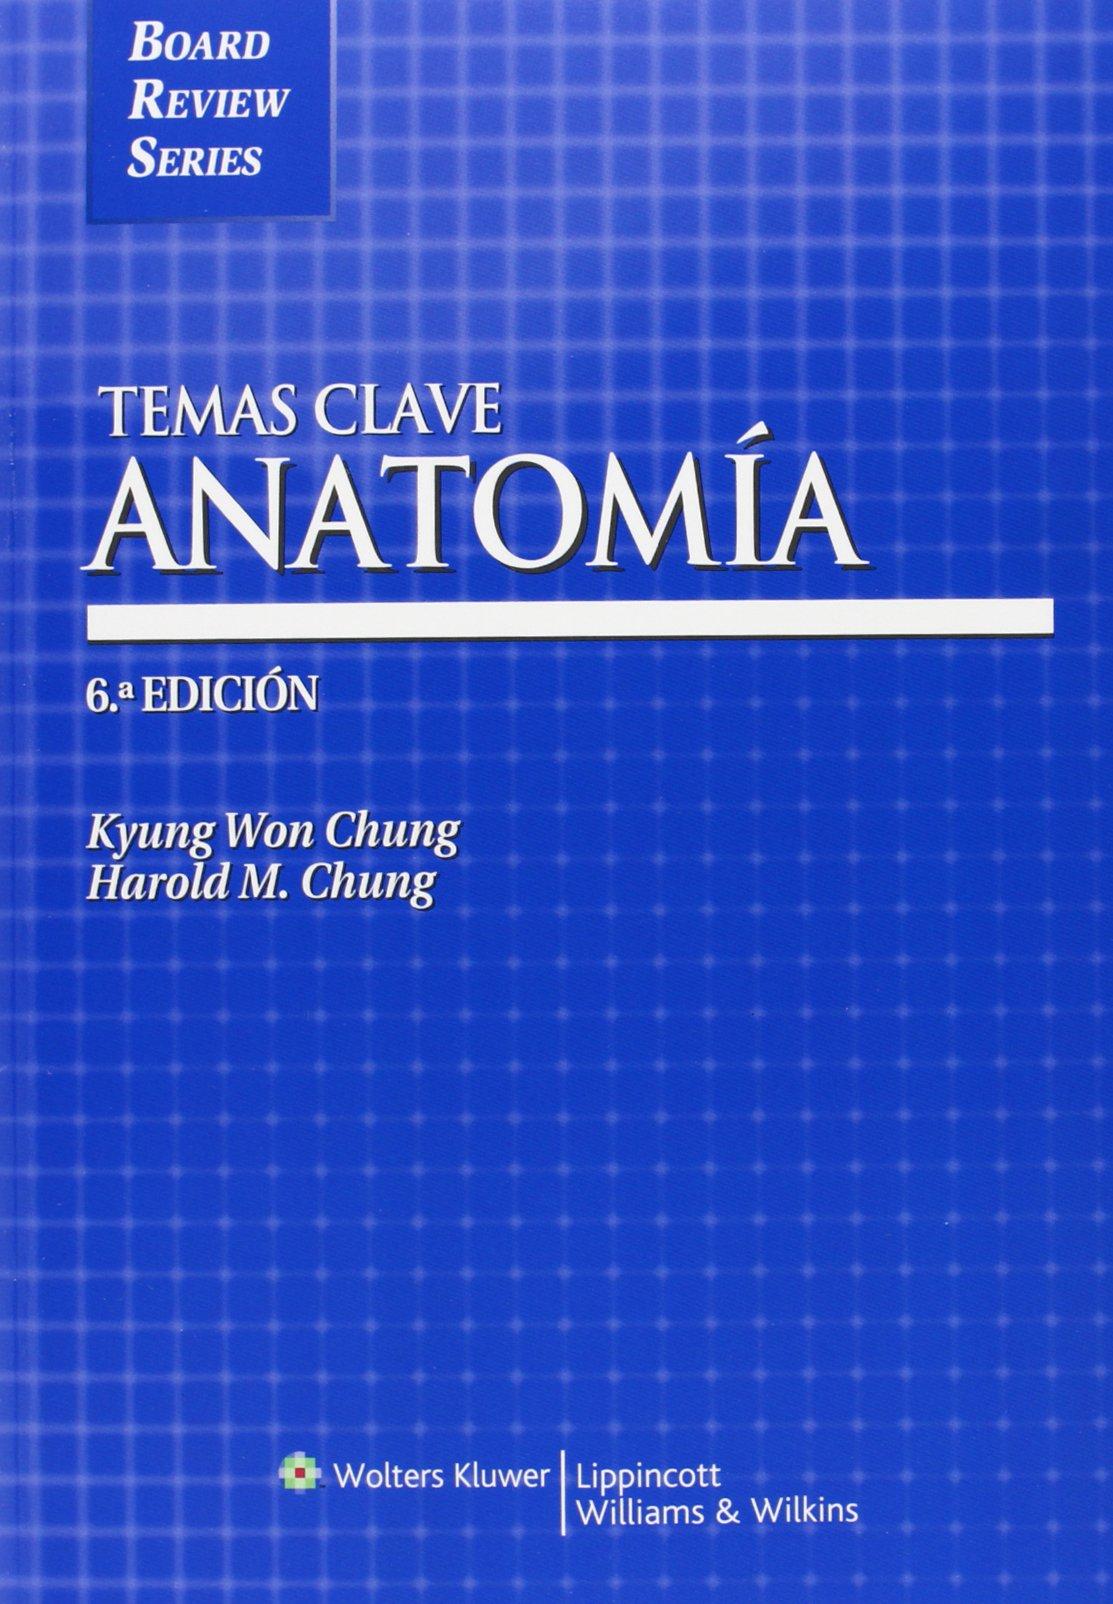 Anatomía (Temas clave): Amazon.es: Kyung Won Chung, Roser Parejo ...